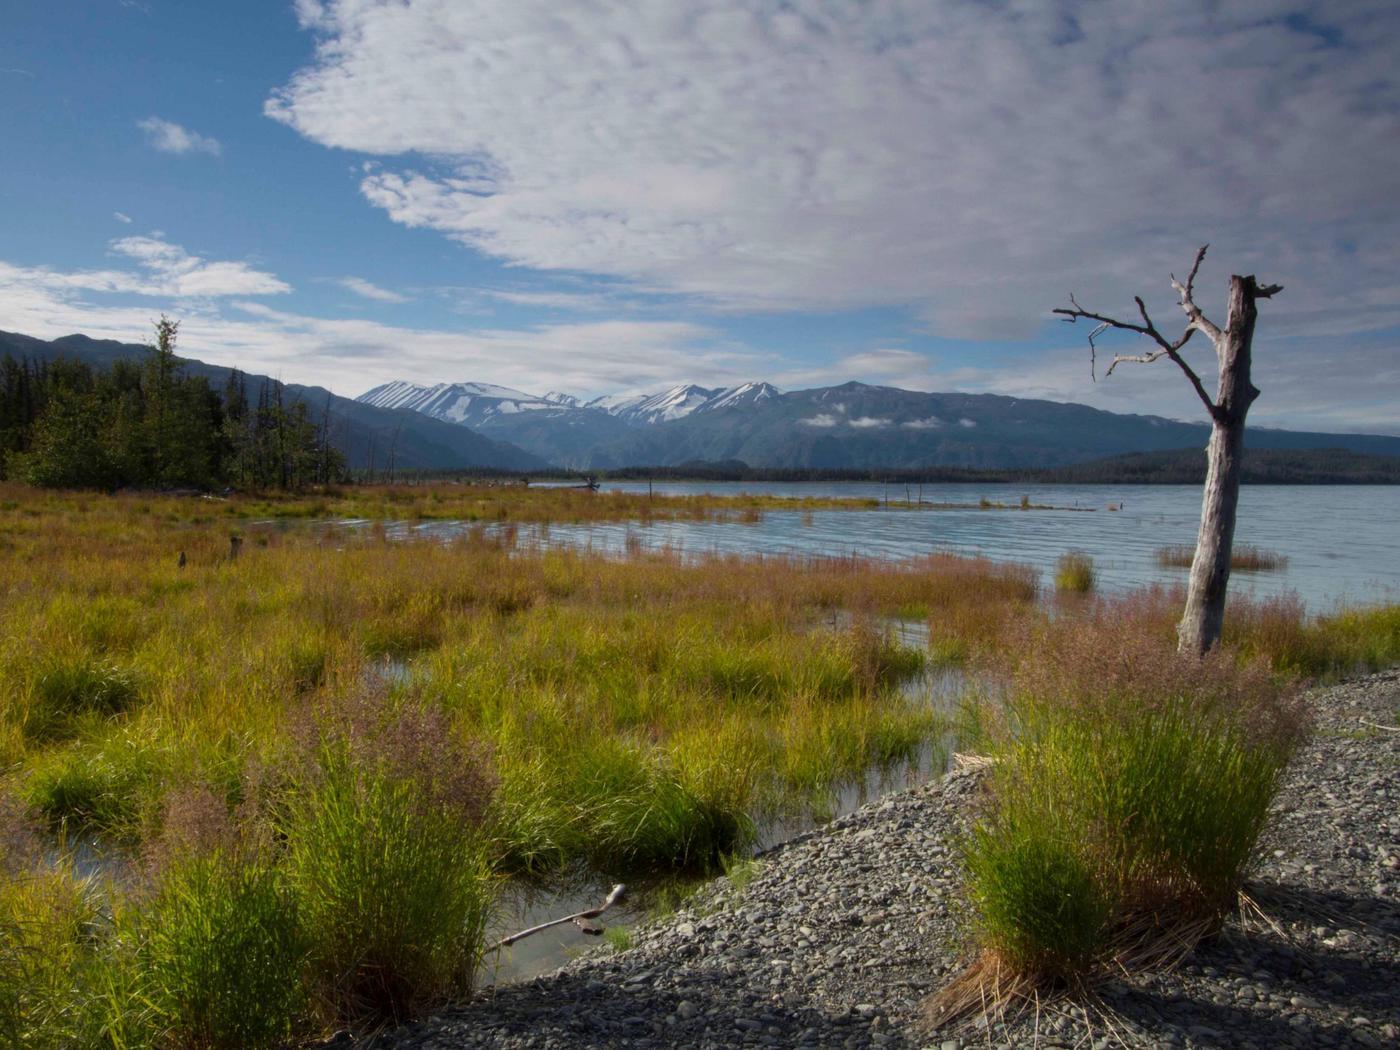 Kenai Wilderness, Managed by the US Fish and Wildlife Service's Kenai National Wildlife Refuge